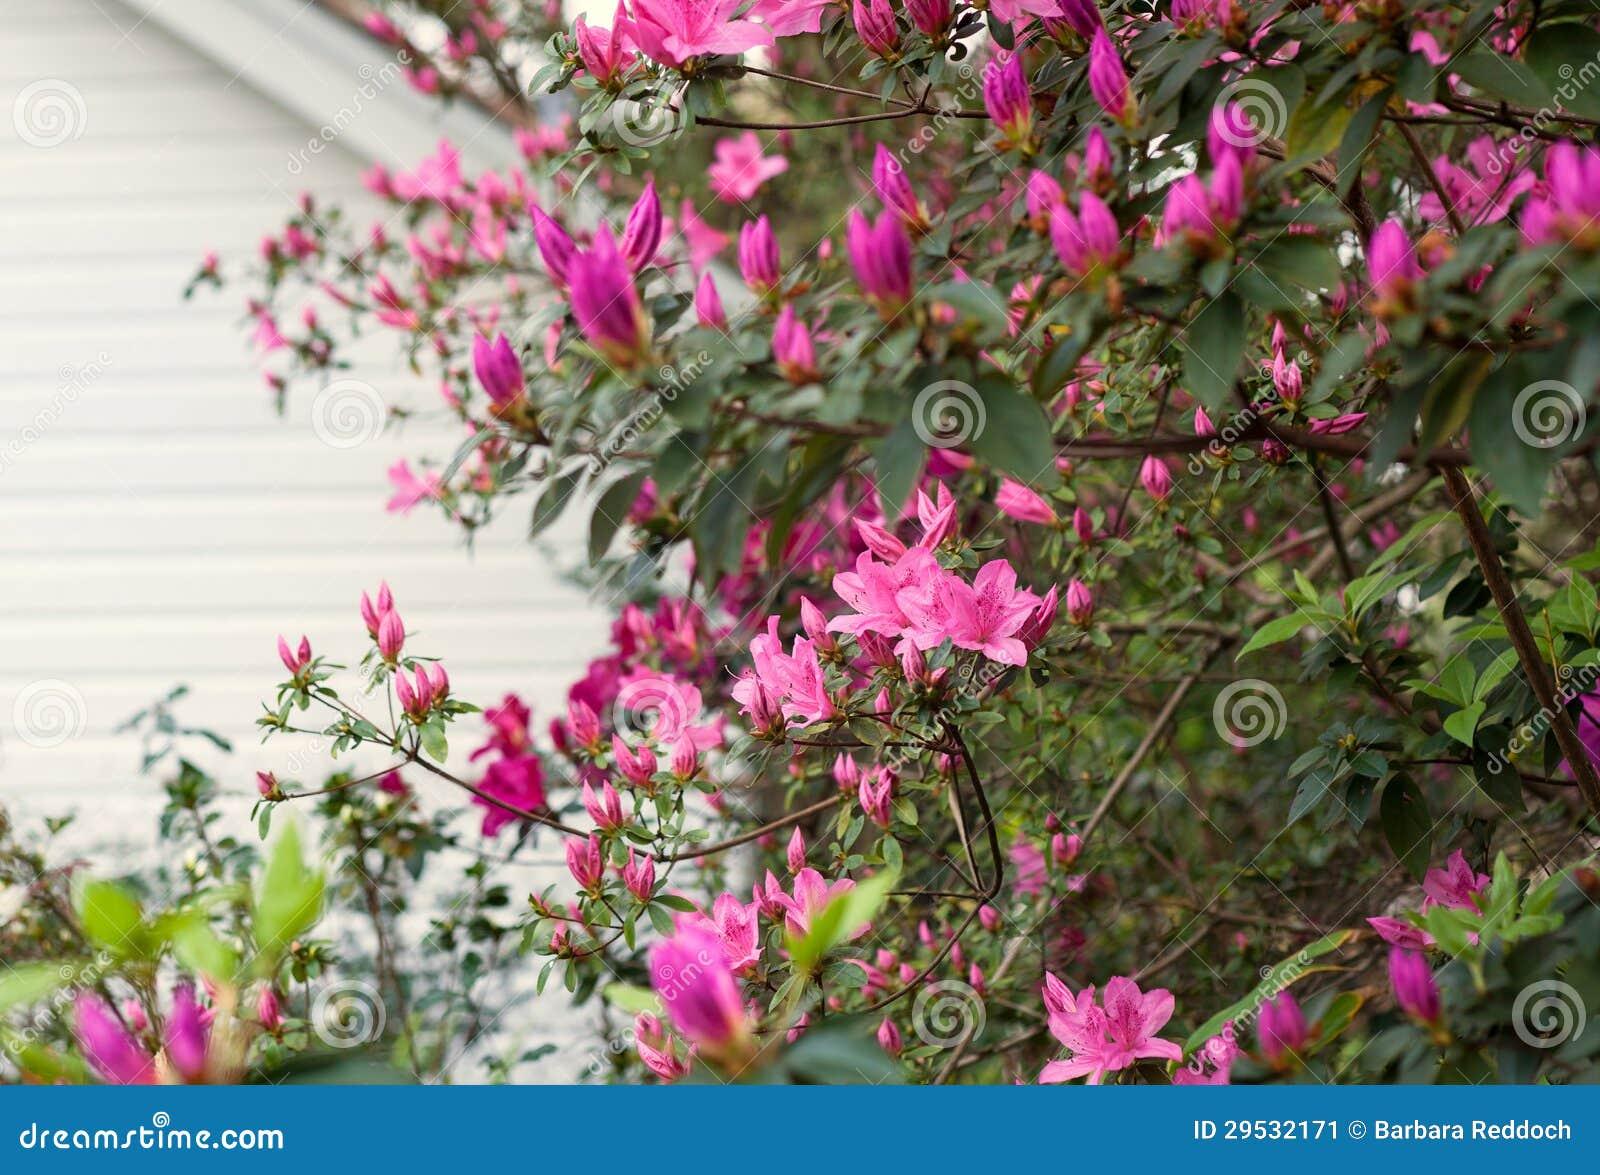 Spring azalea bush bursting with blossoms and new growth stock image download spring azalea bush bursting with blossoms and new growth stock image image of plant mightylinksfo